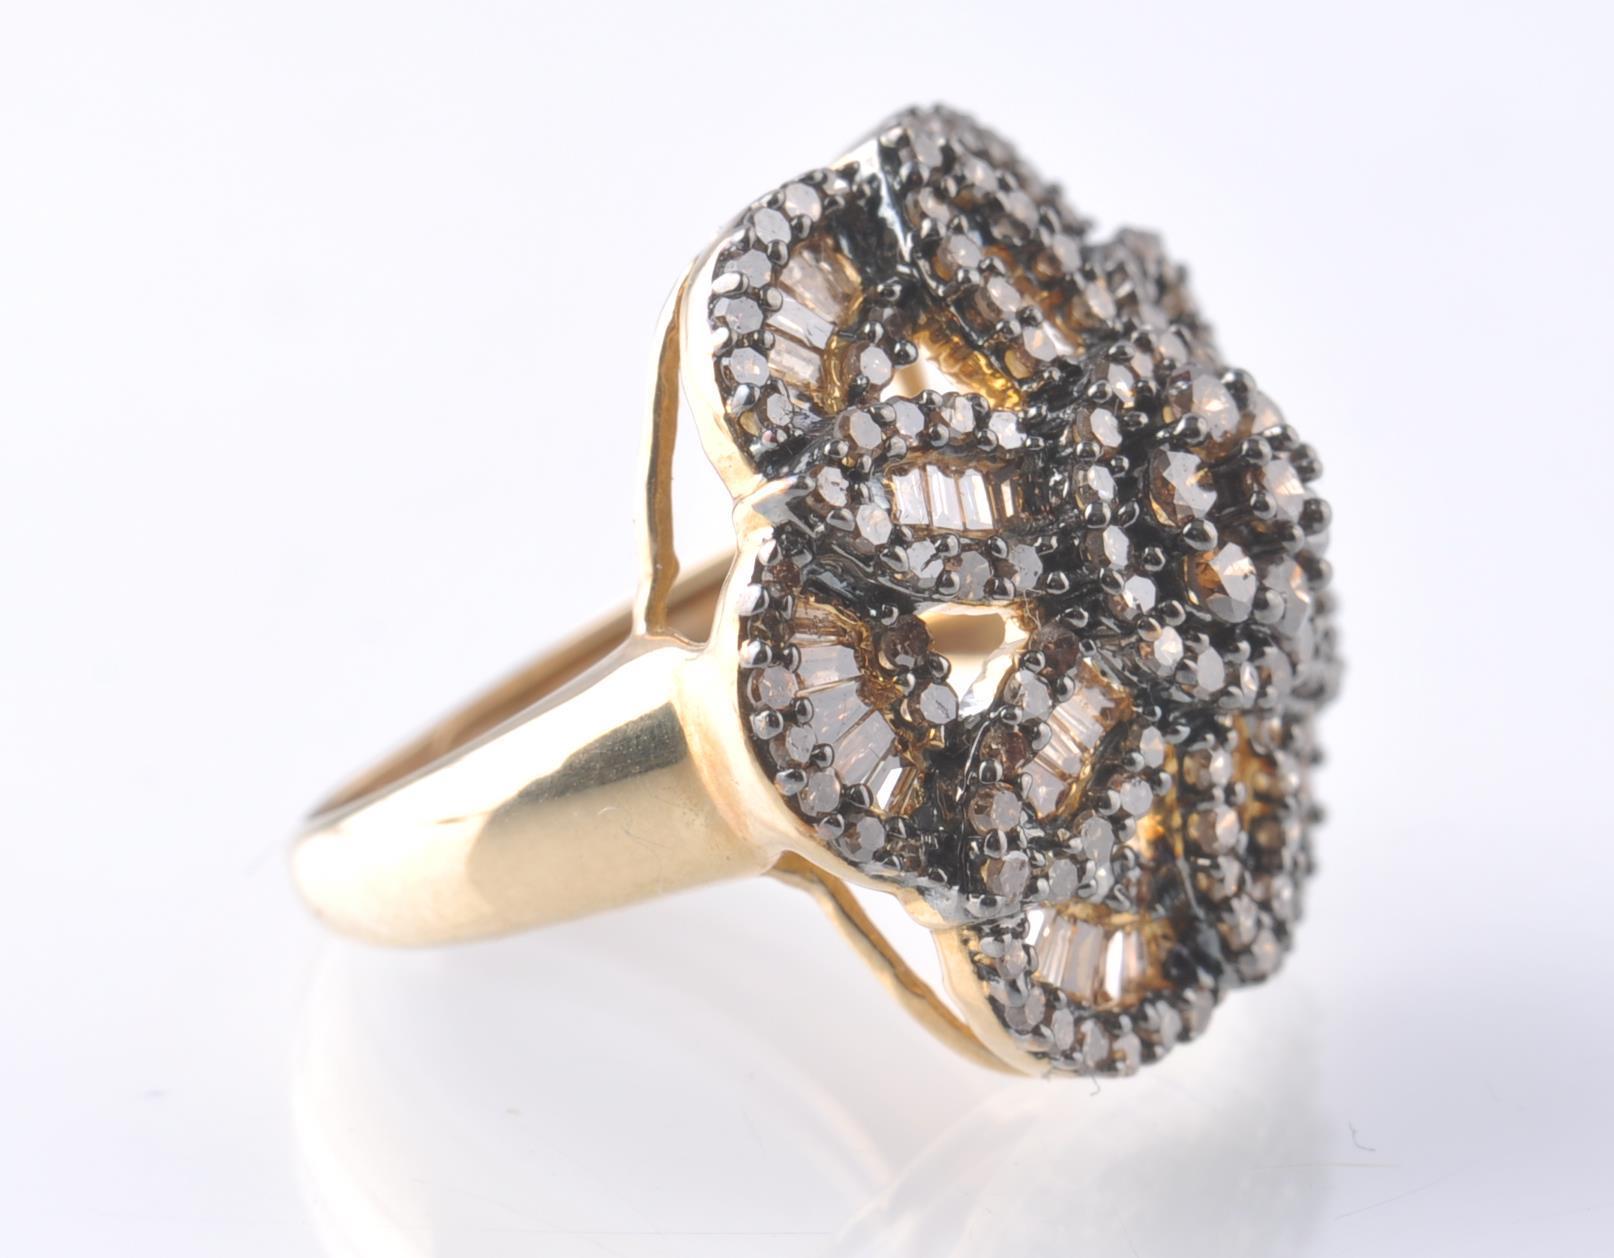 9CT GOLD BIRMINGHAM CHAMPAGNE DIAMOND FLOWER CLUST - Image 3 of 4